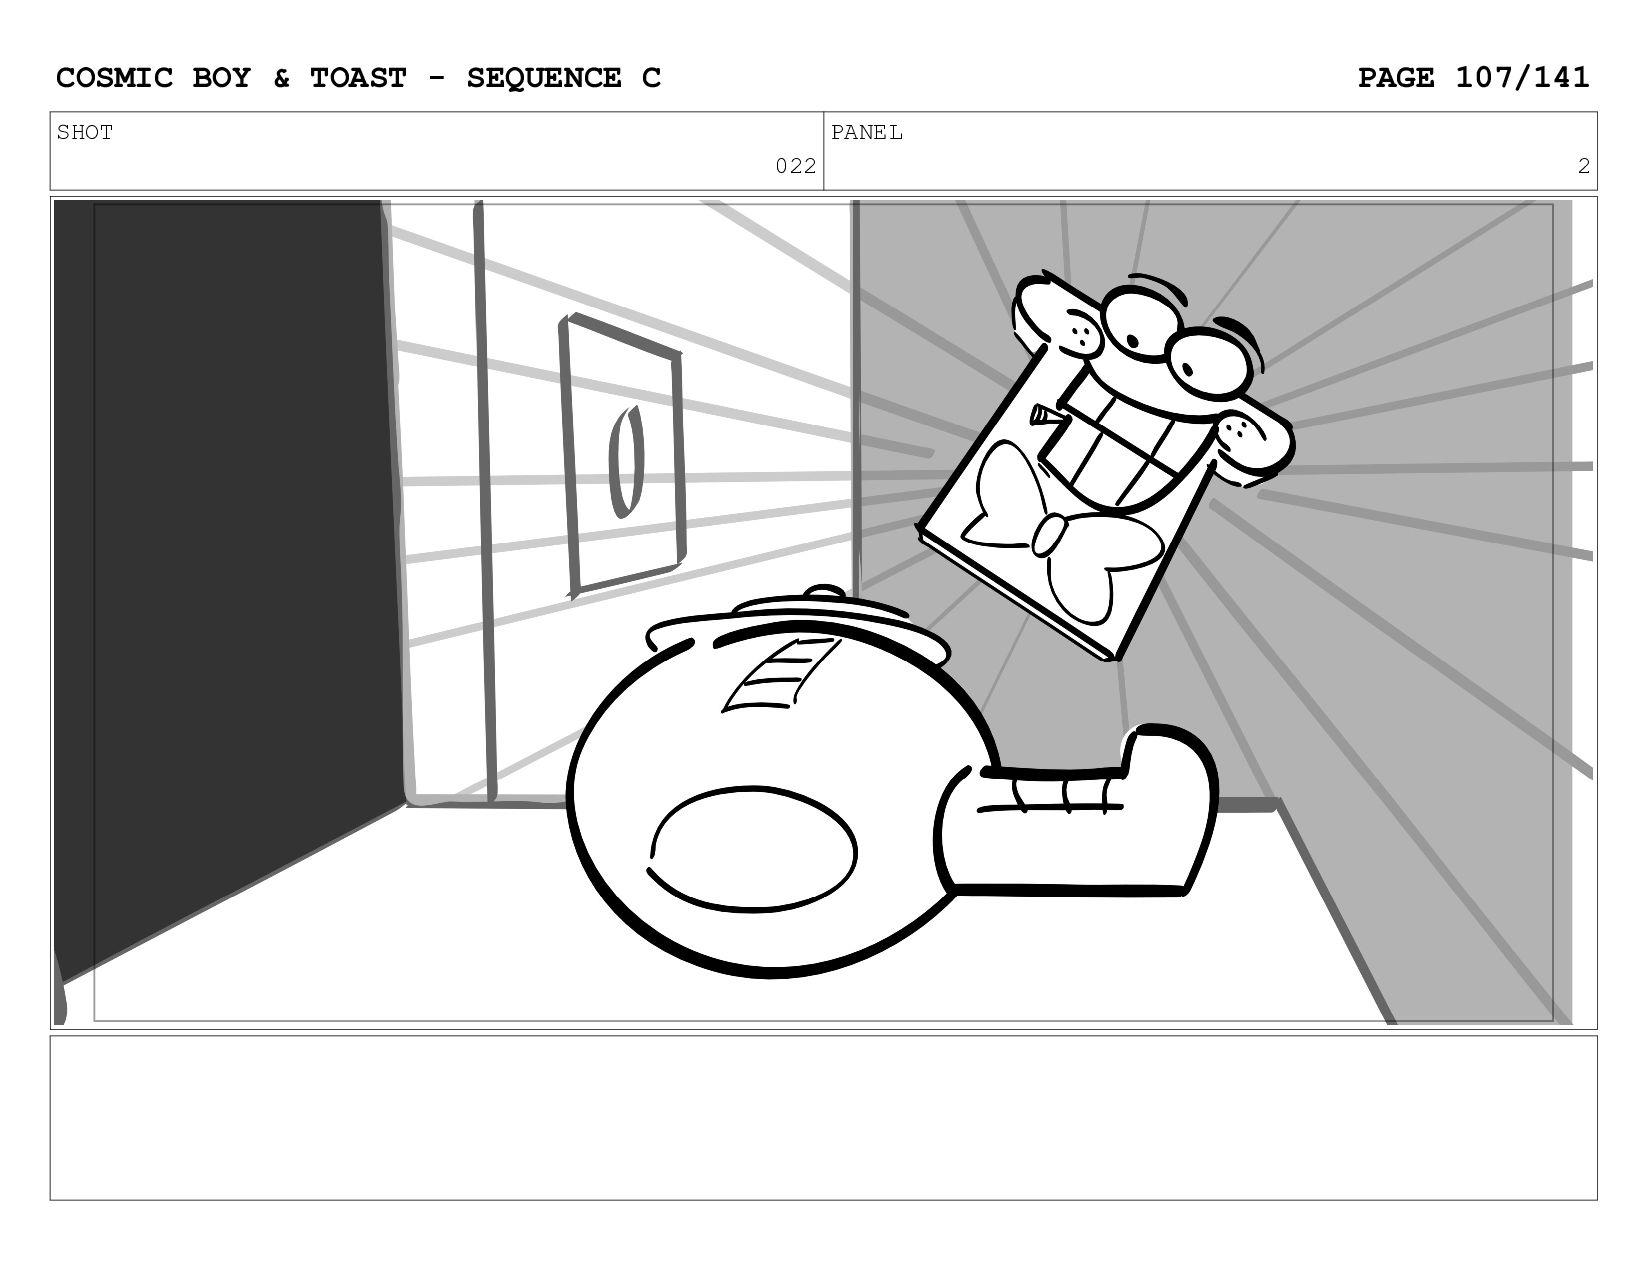 SCENE 022 PANEL B COSMIC BOY & TOAST - SEQUENCE...